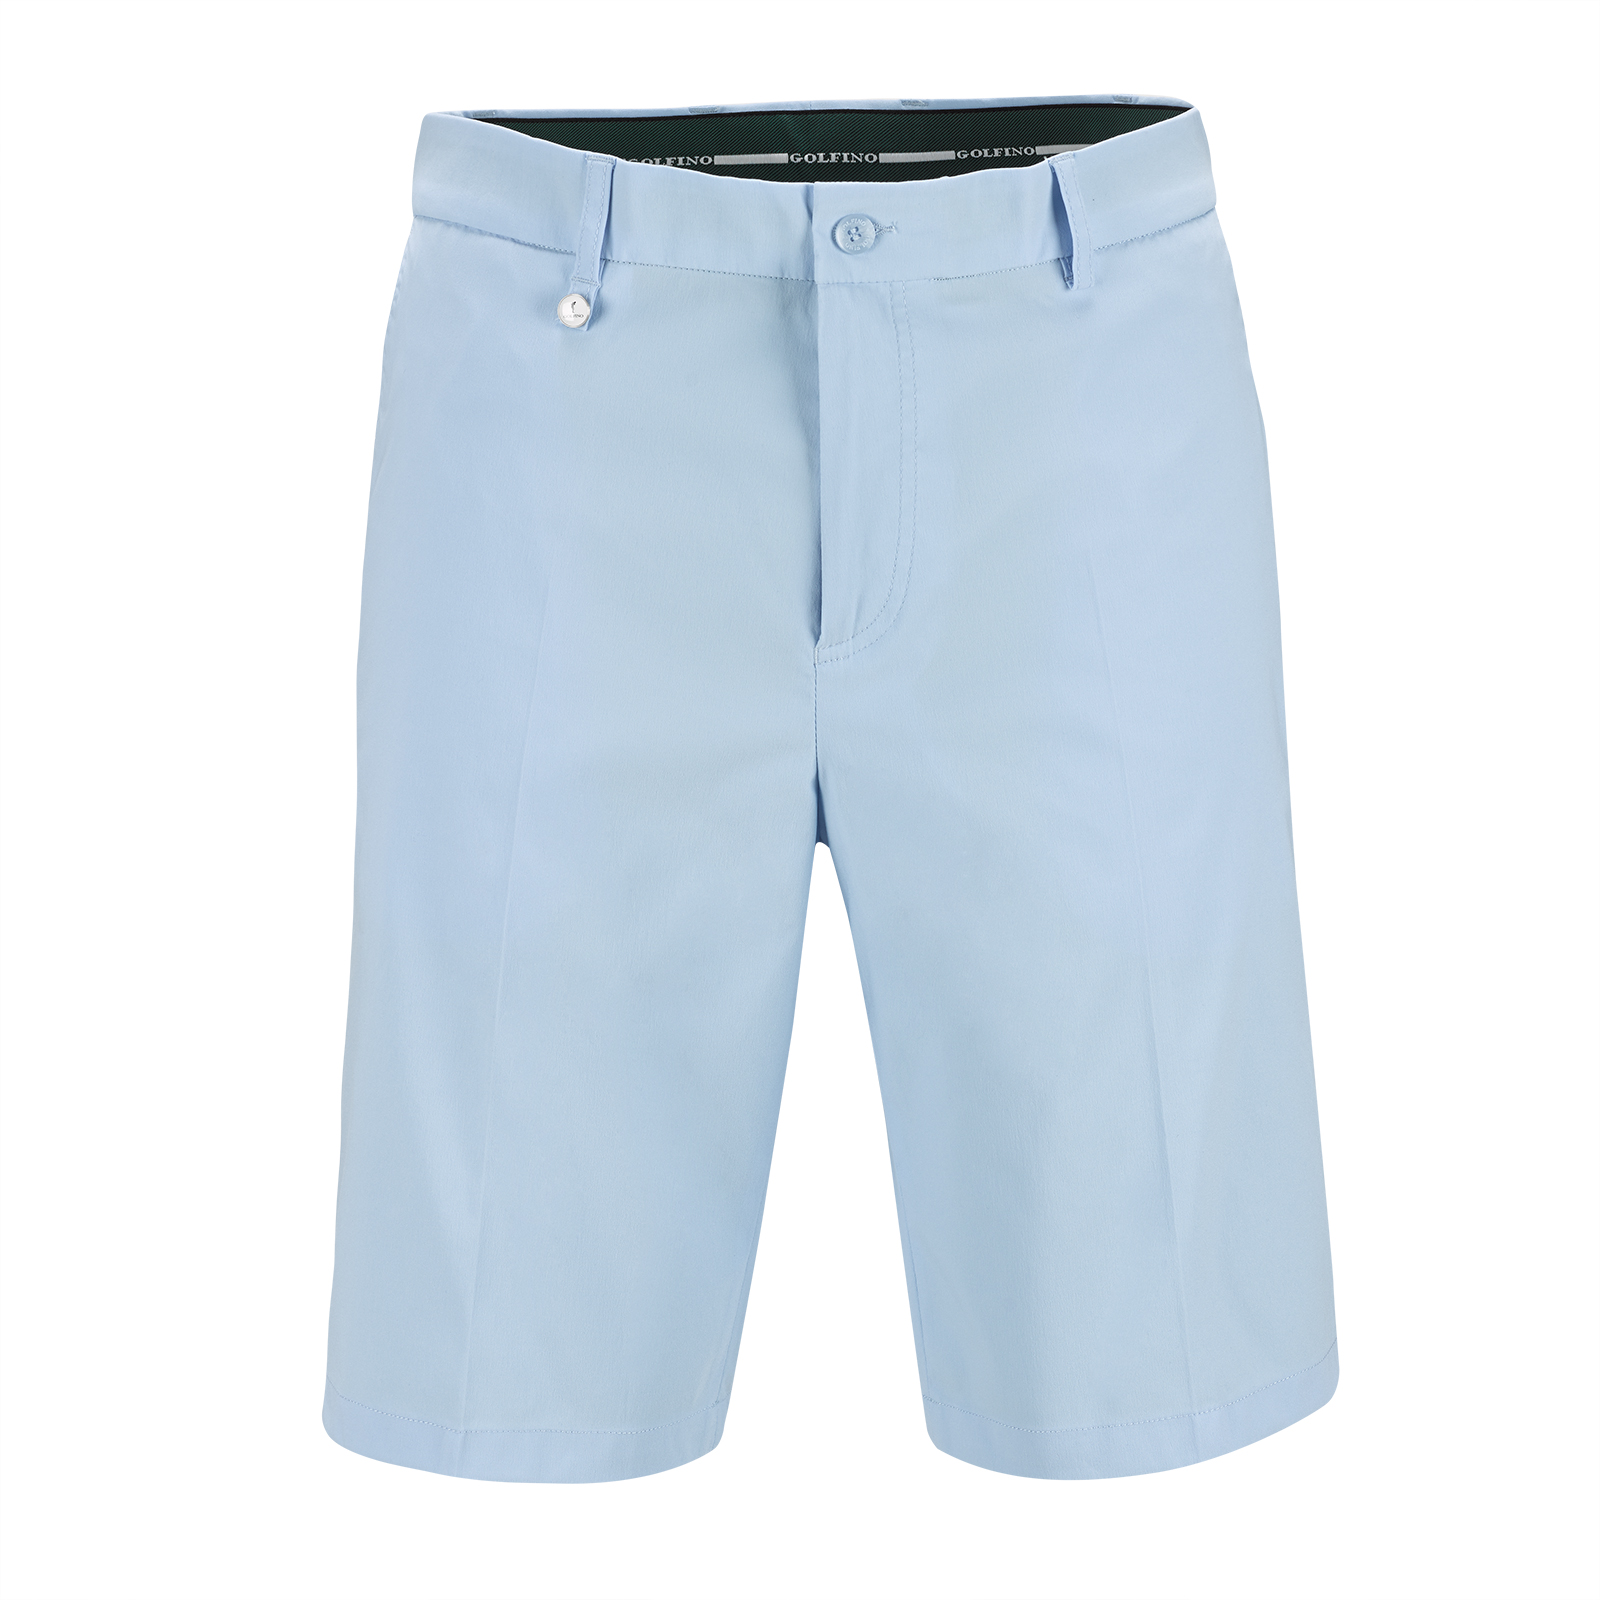 Light Techno Stretch Herren Golf-Bermuda Sun Protection in Comfortable Fit